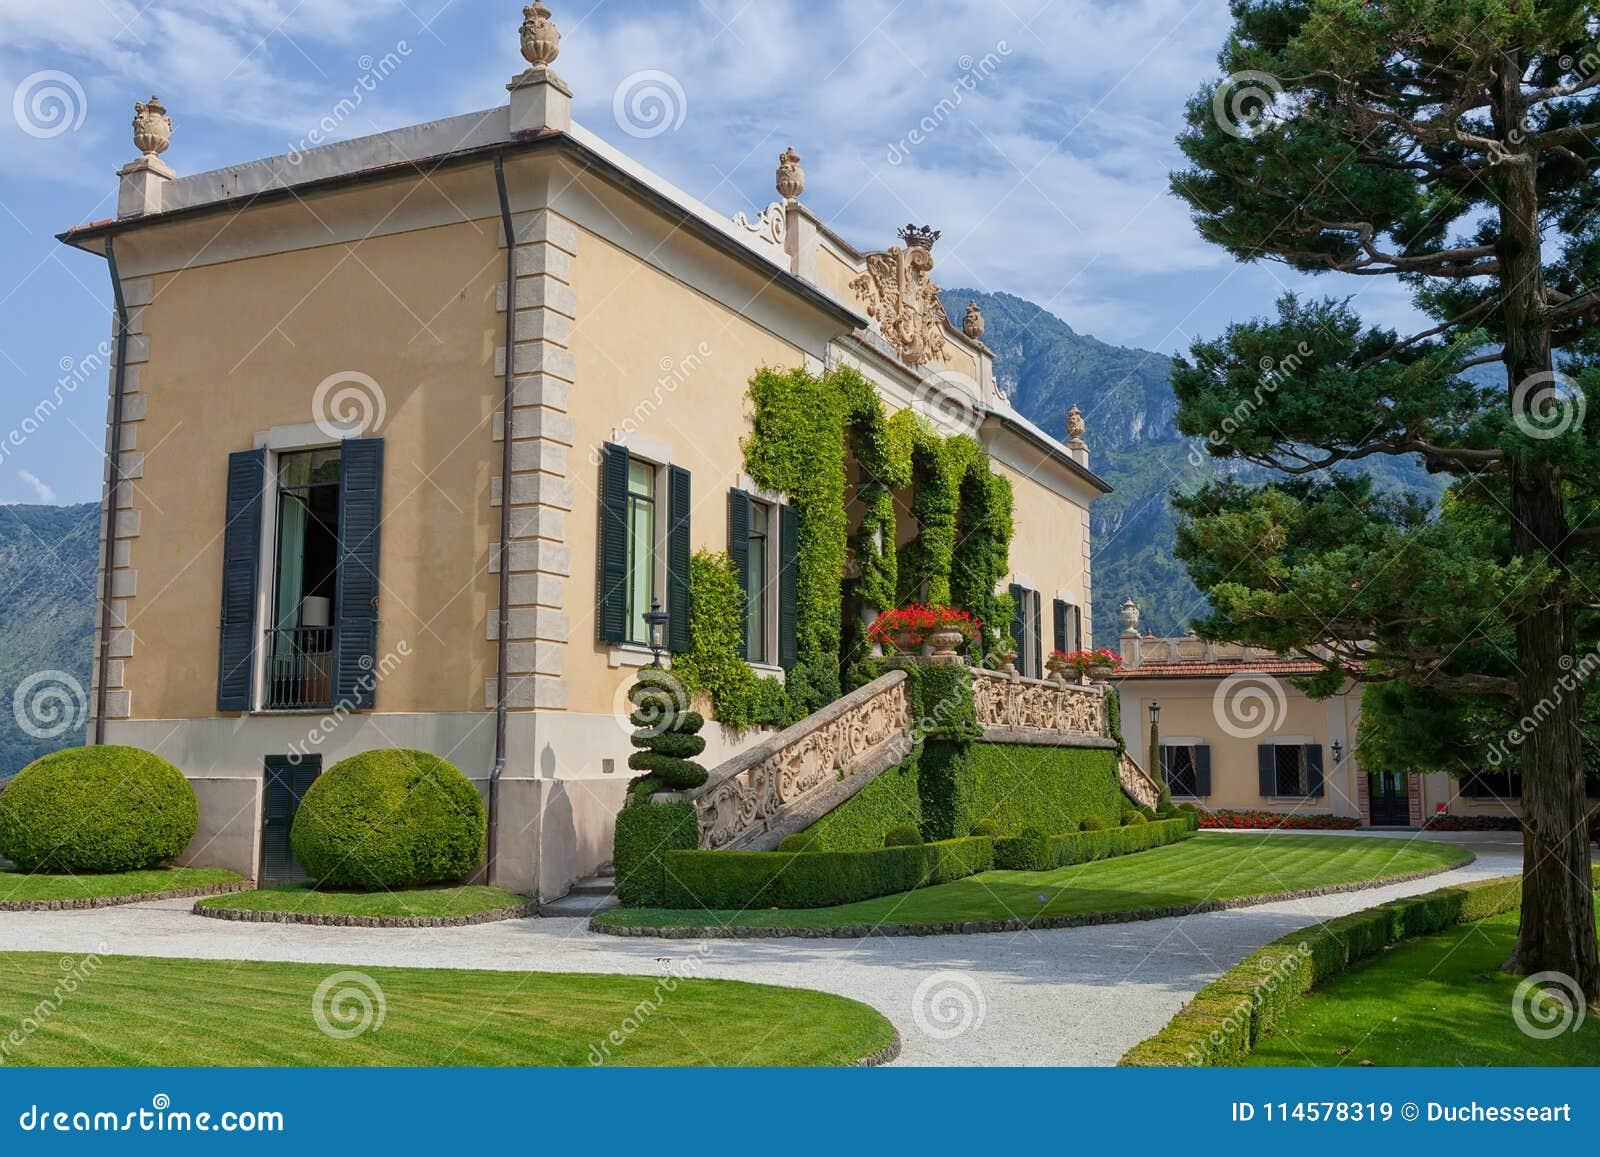 Villa del Balbianello på sjön Como, Lenno, Lombardia, Italien